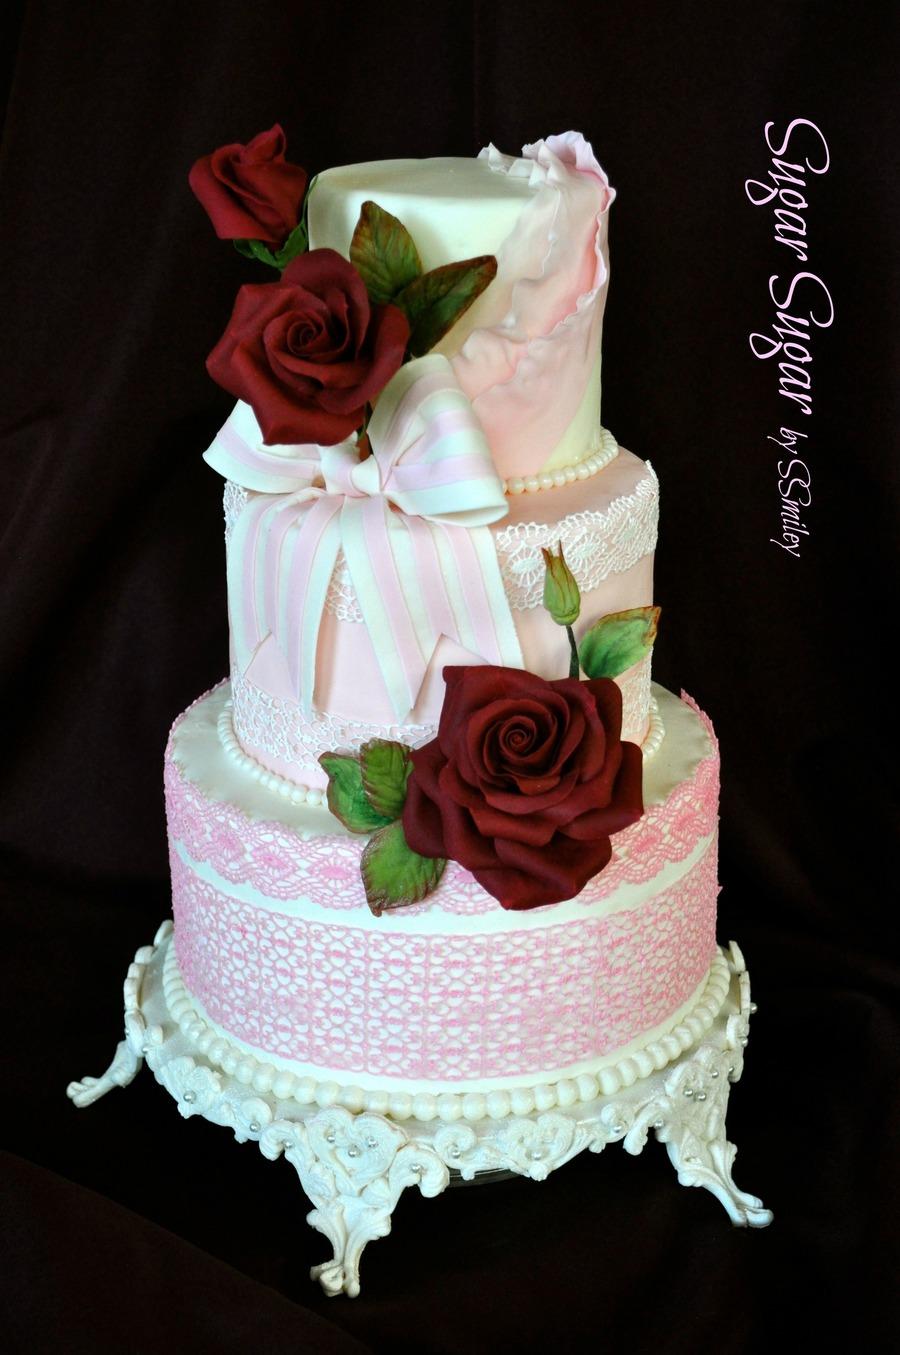 Happy Birthday Bonnie Cakecentral Com